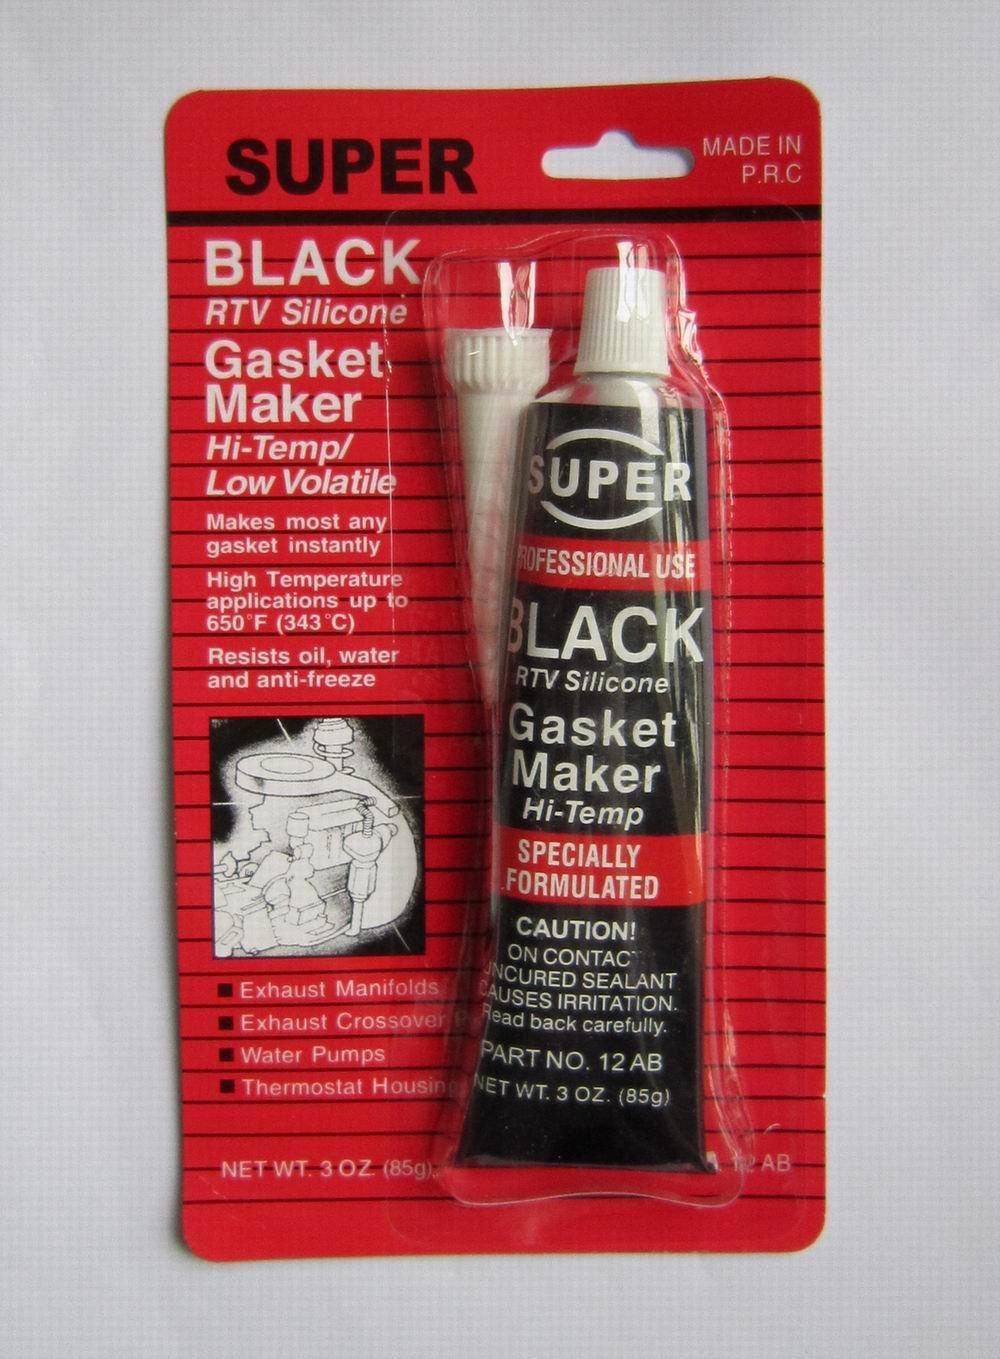 KTR333 Neutral Silicone Gasket Maker